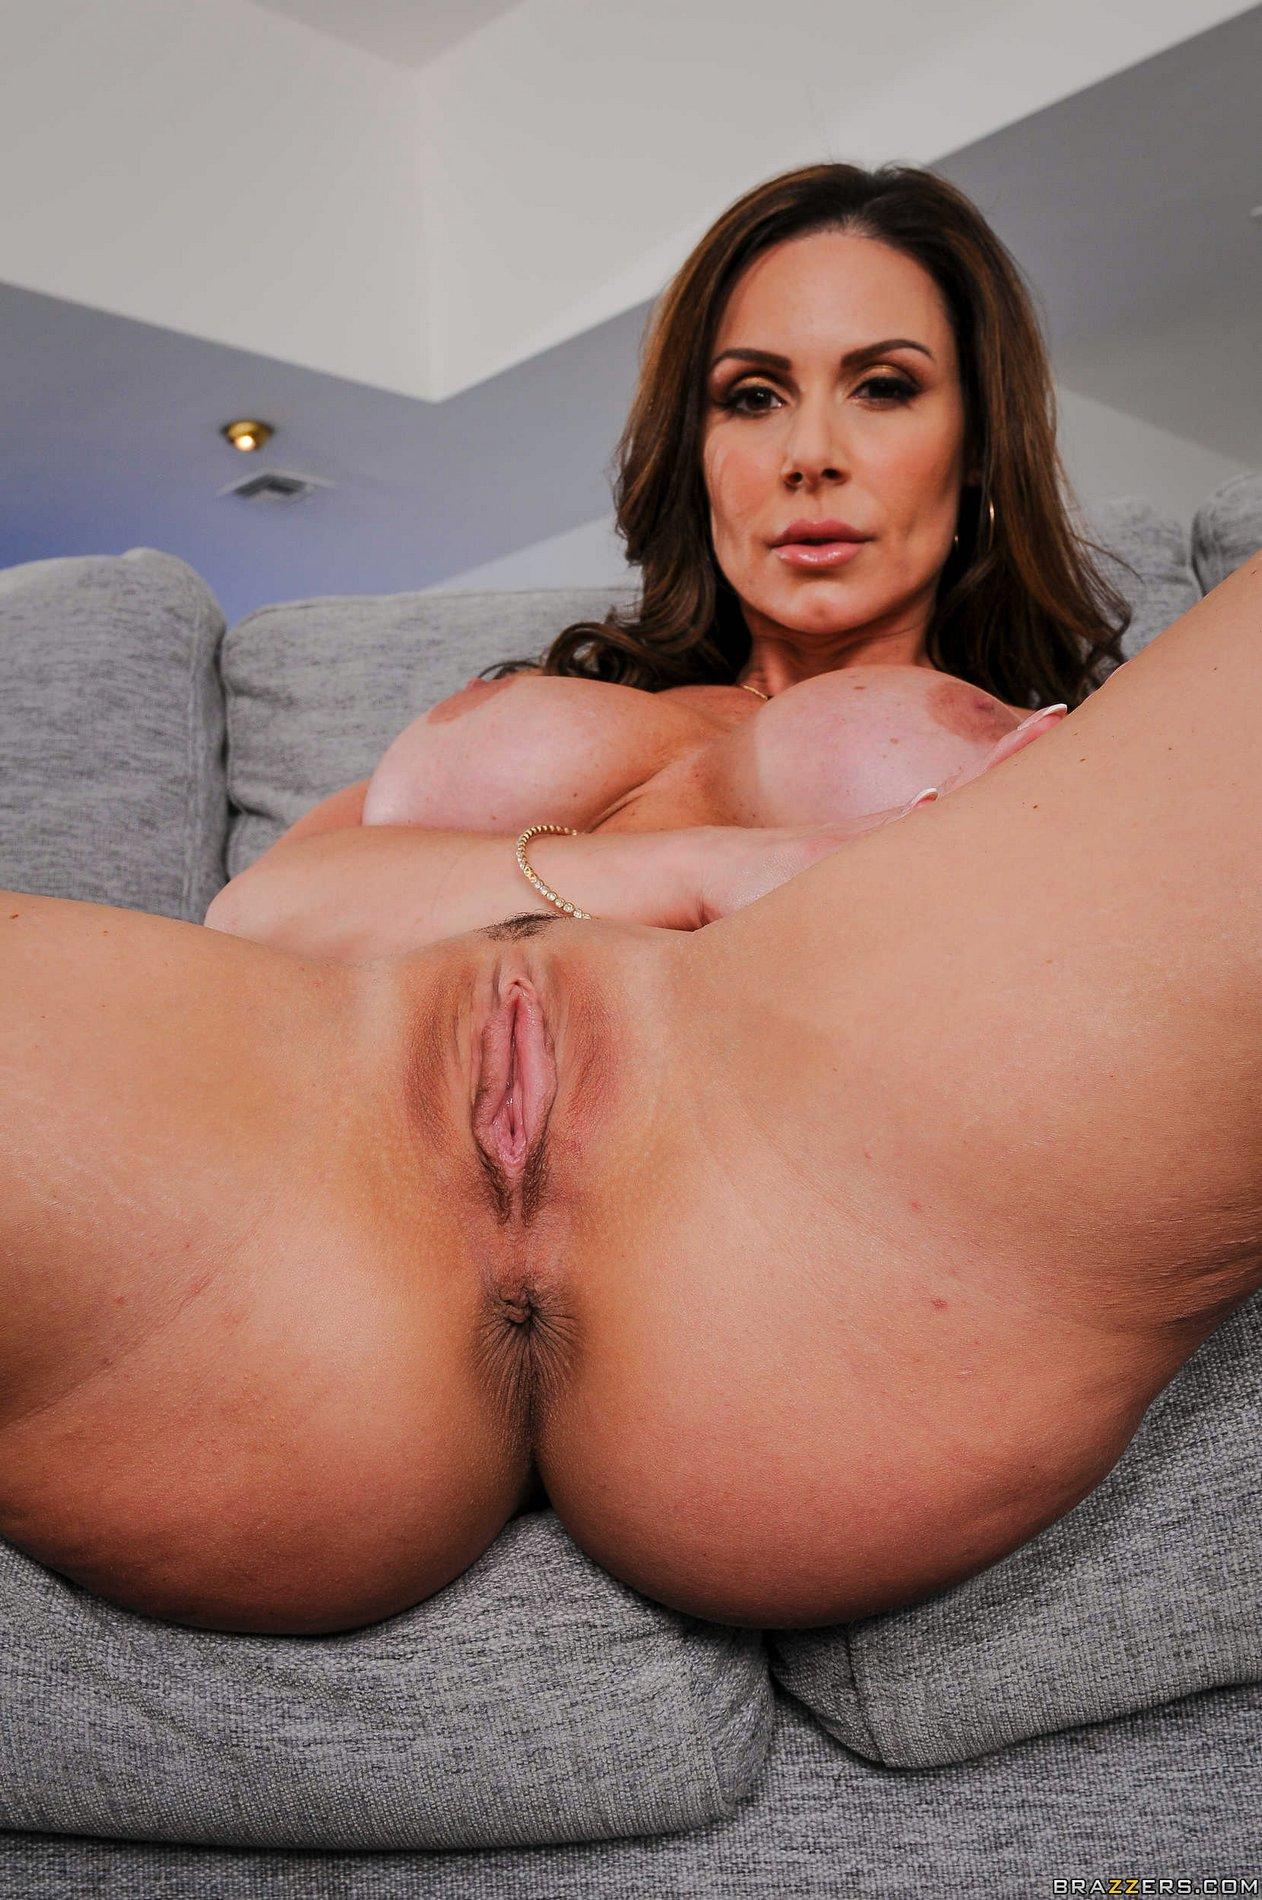 Lesbische Lust 28 Gratis Porno Filme - MadchenSexcom